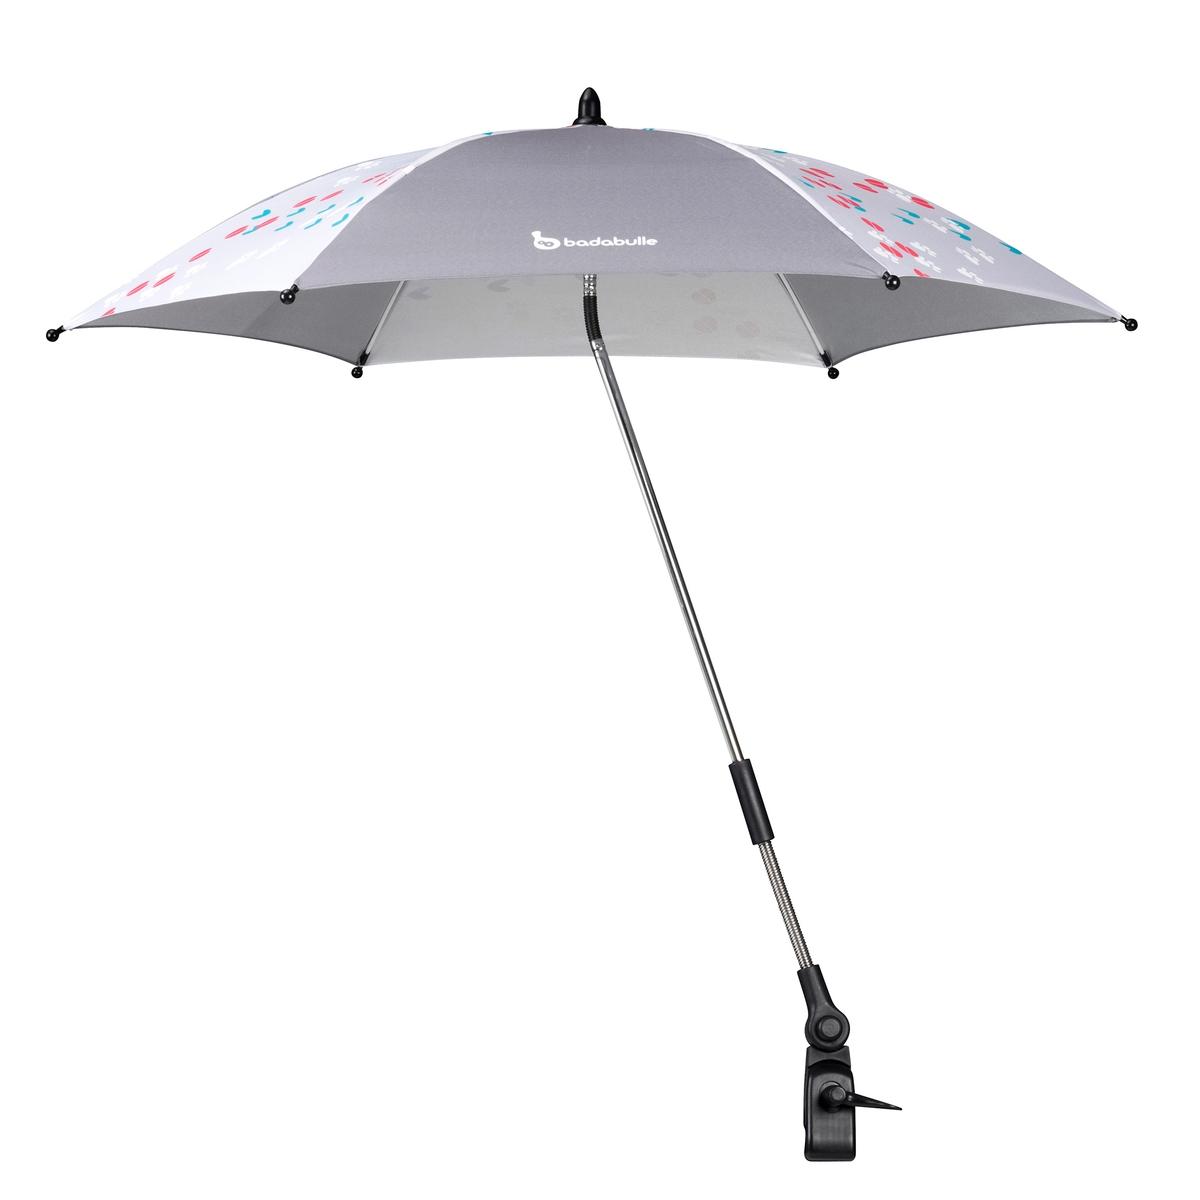 An image of Badabulle Grey Parasol